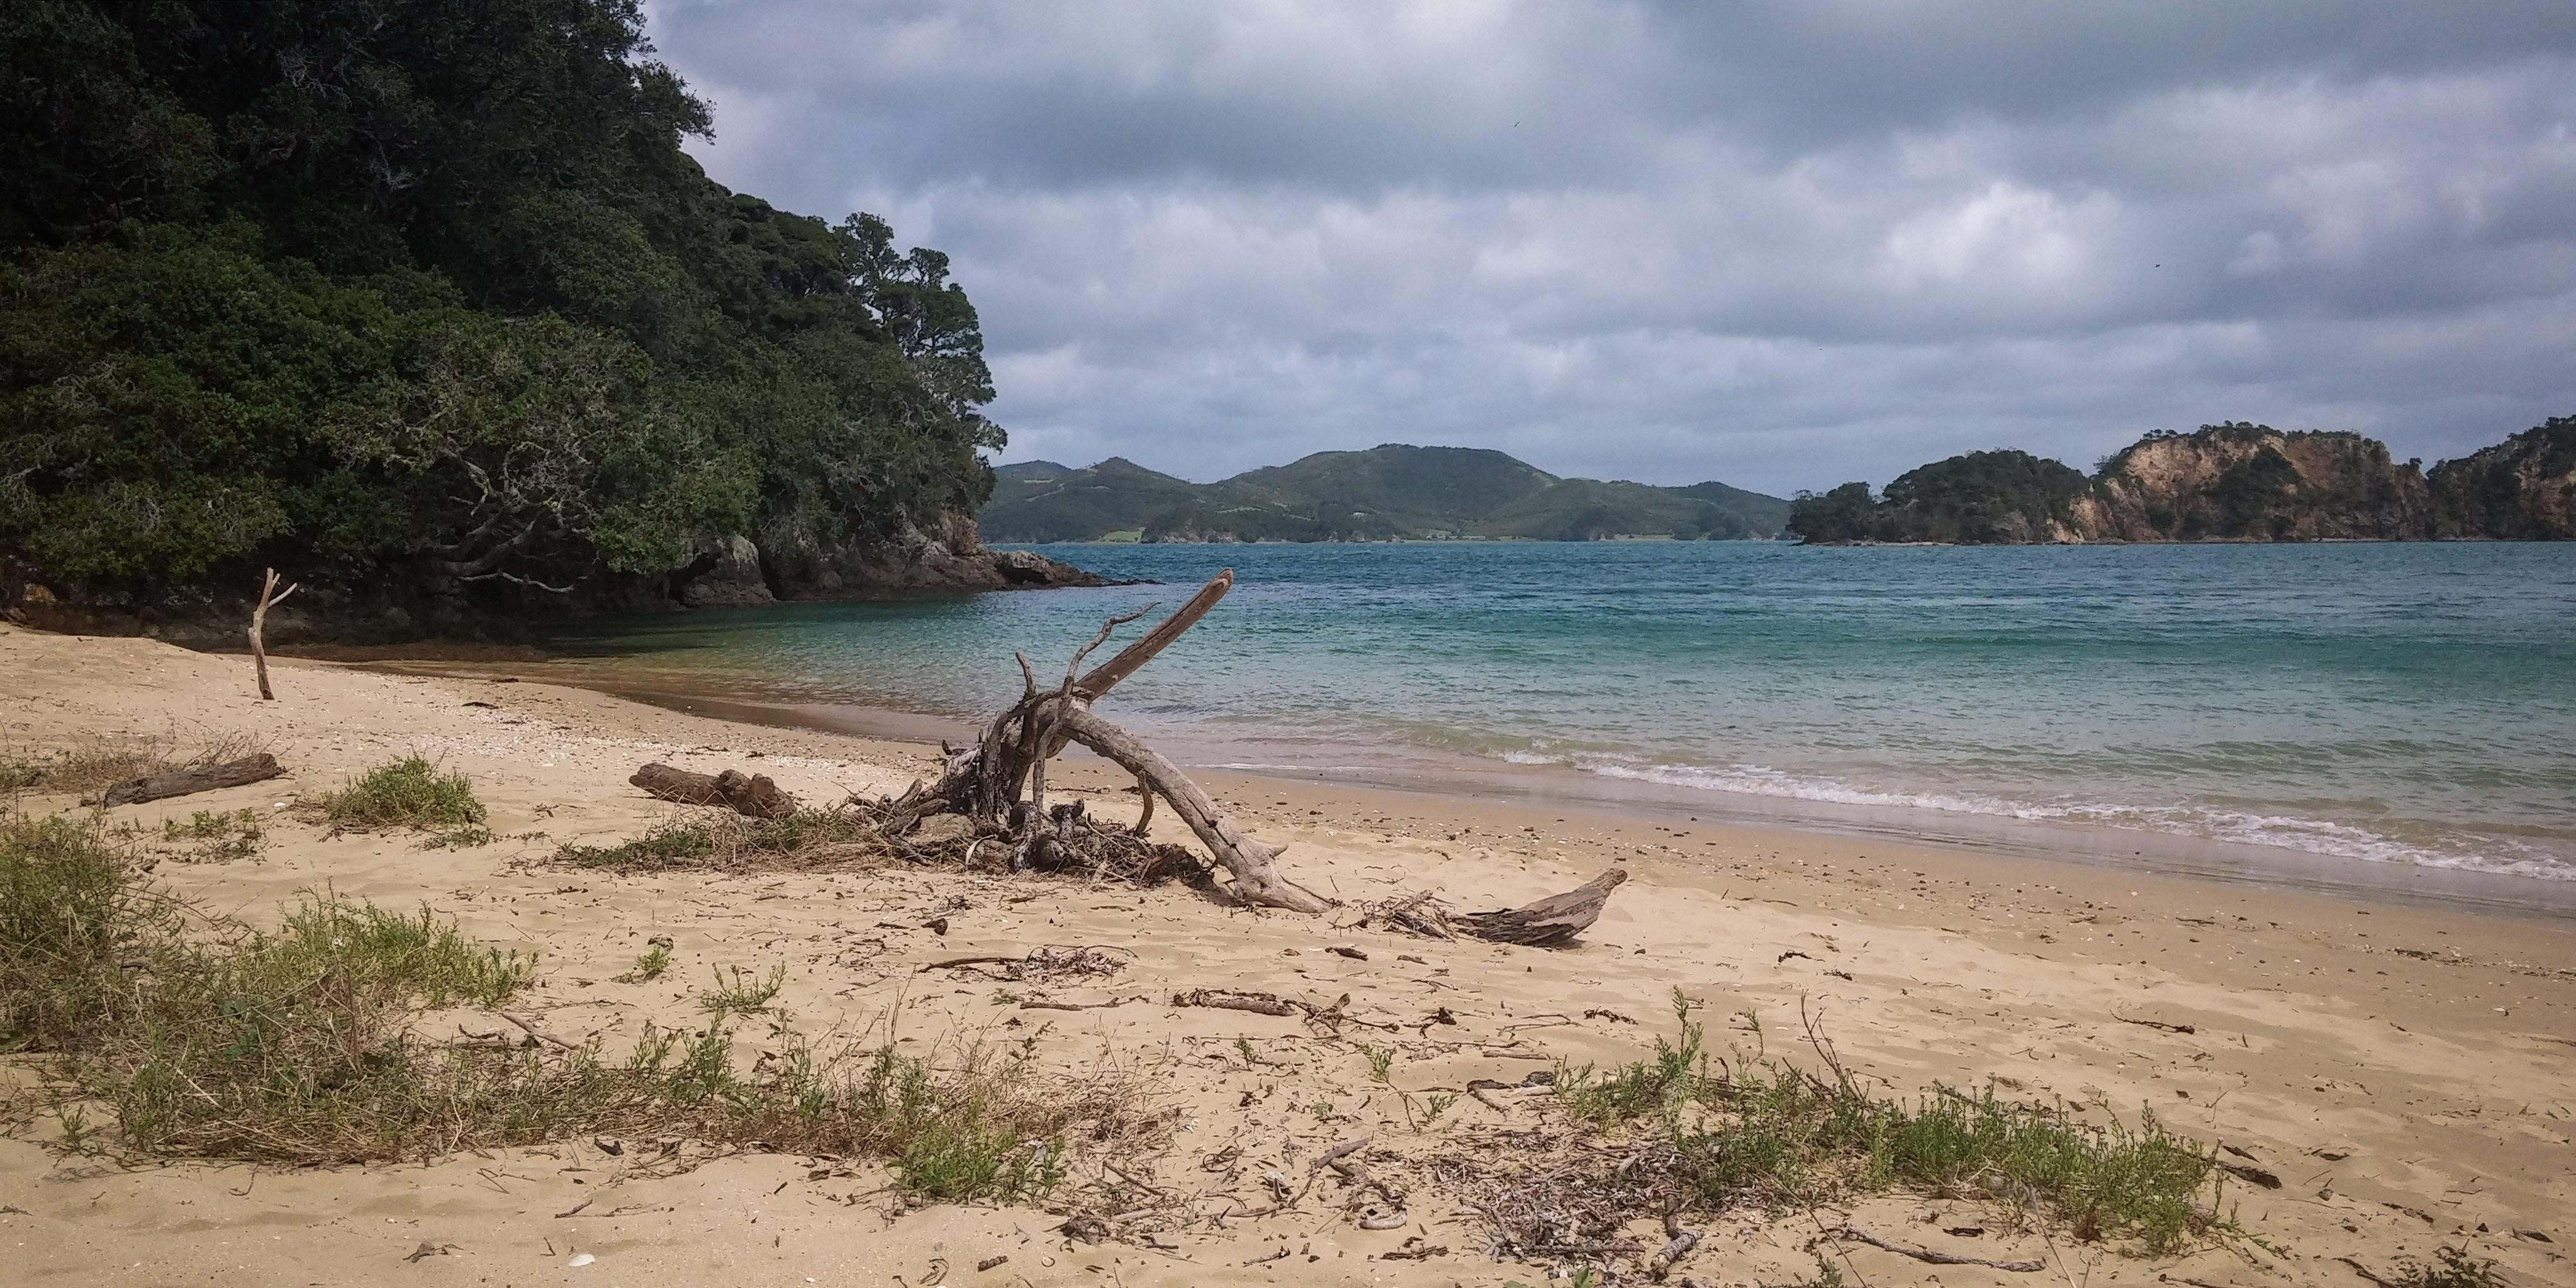 Driftwood on shore photo